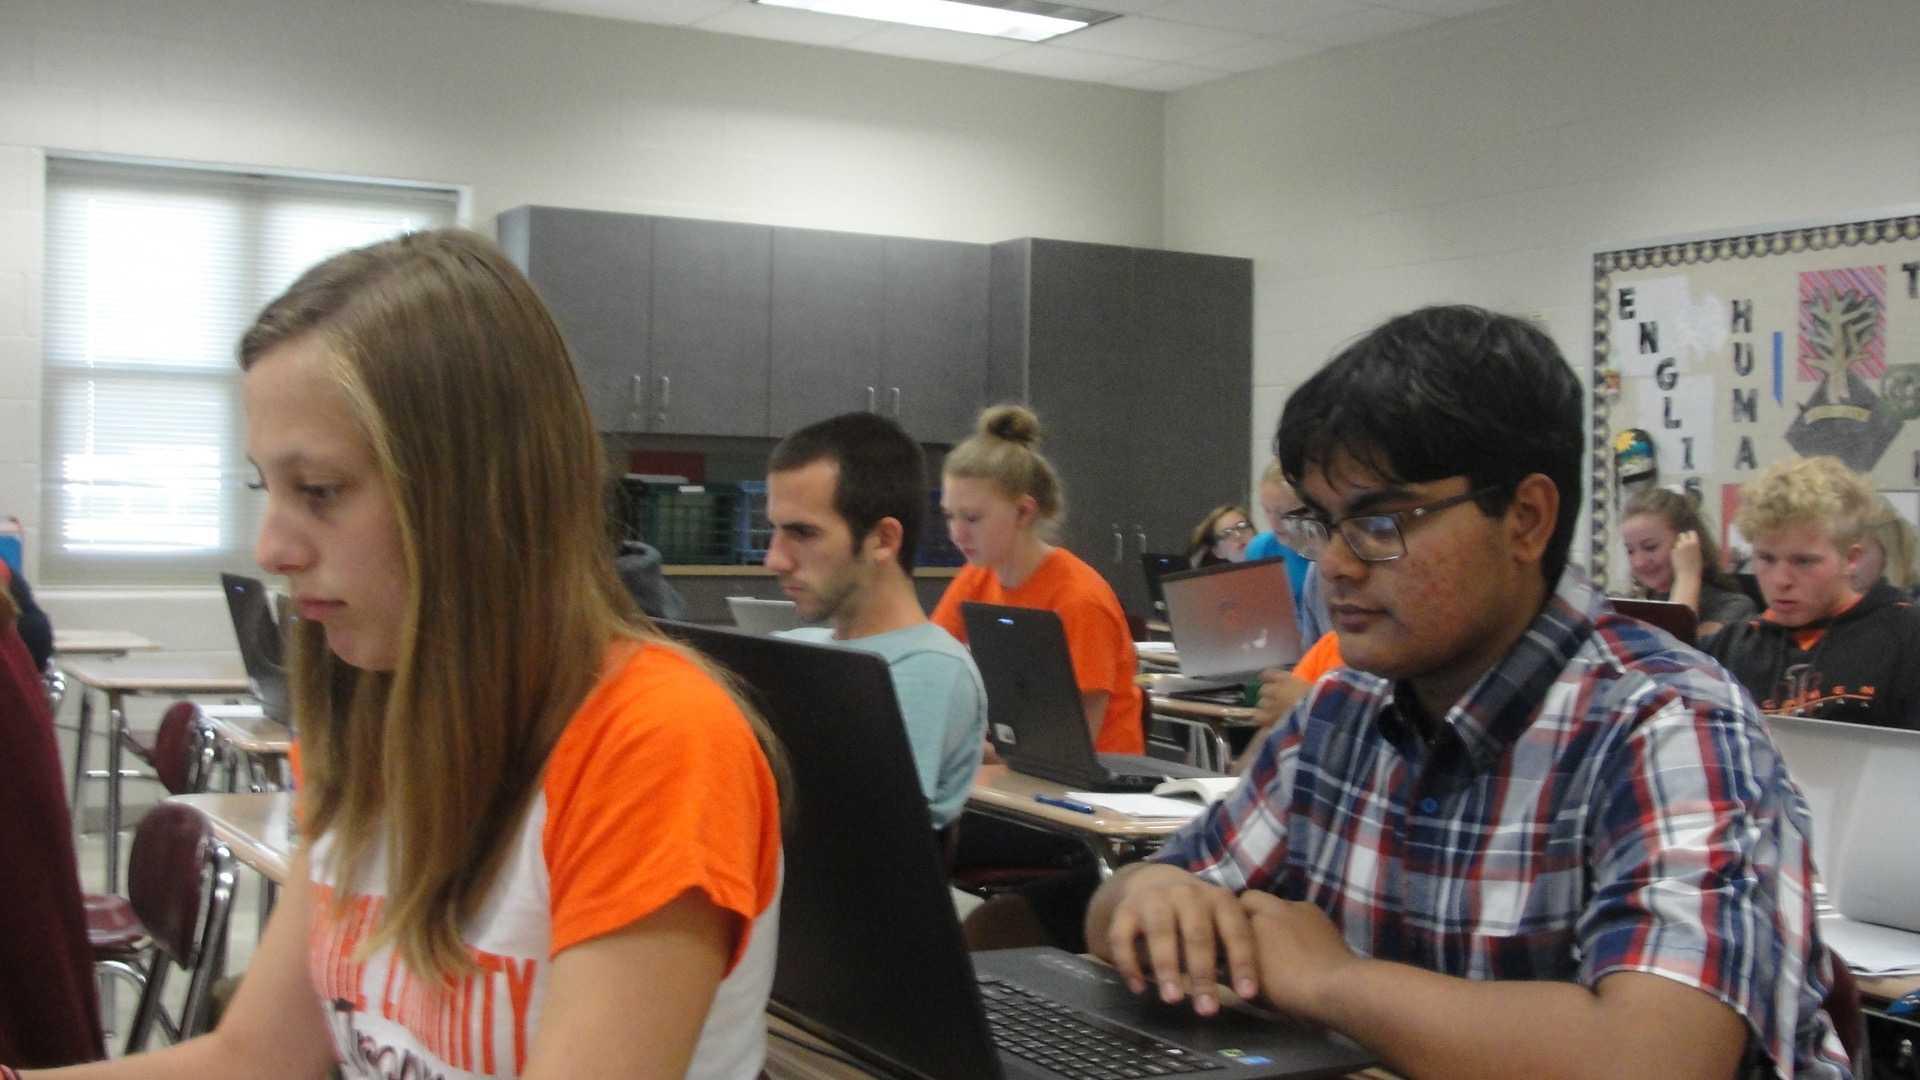 Soumt Lahiri (12) and Kyleakin Helm (12) work hard during AP Literature. (Sept. 21-25)